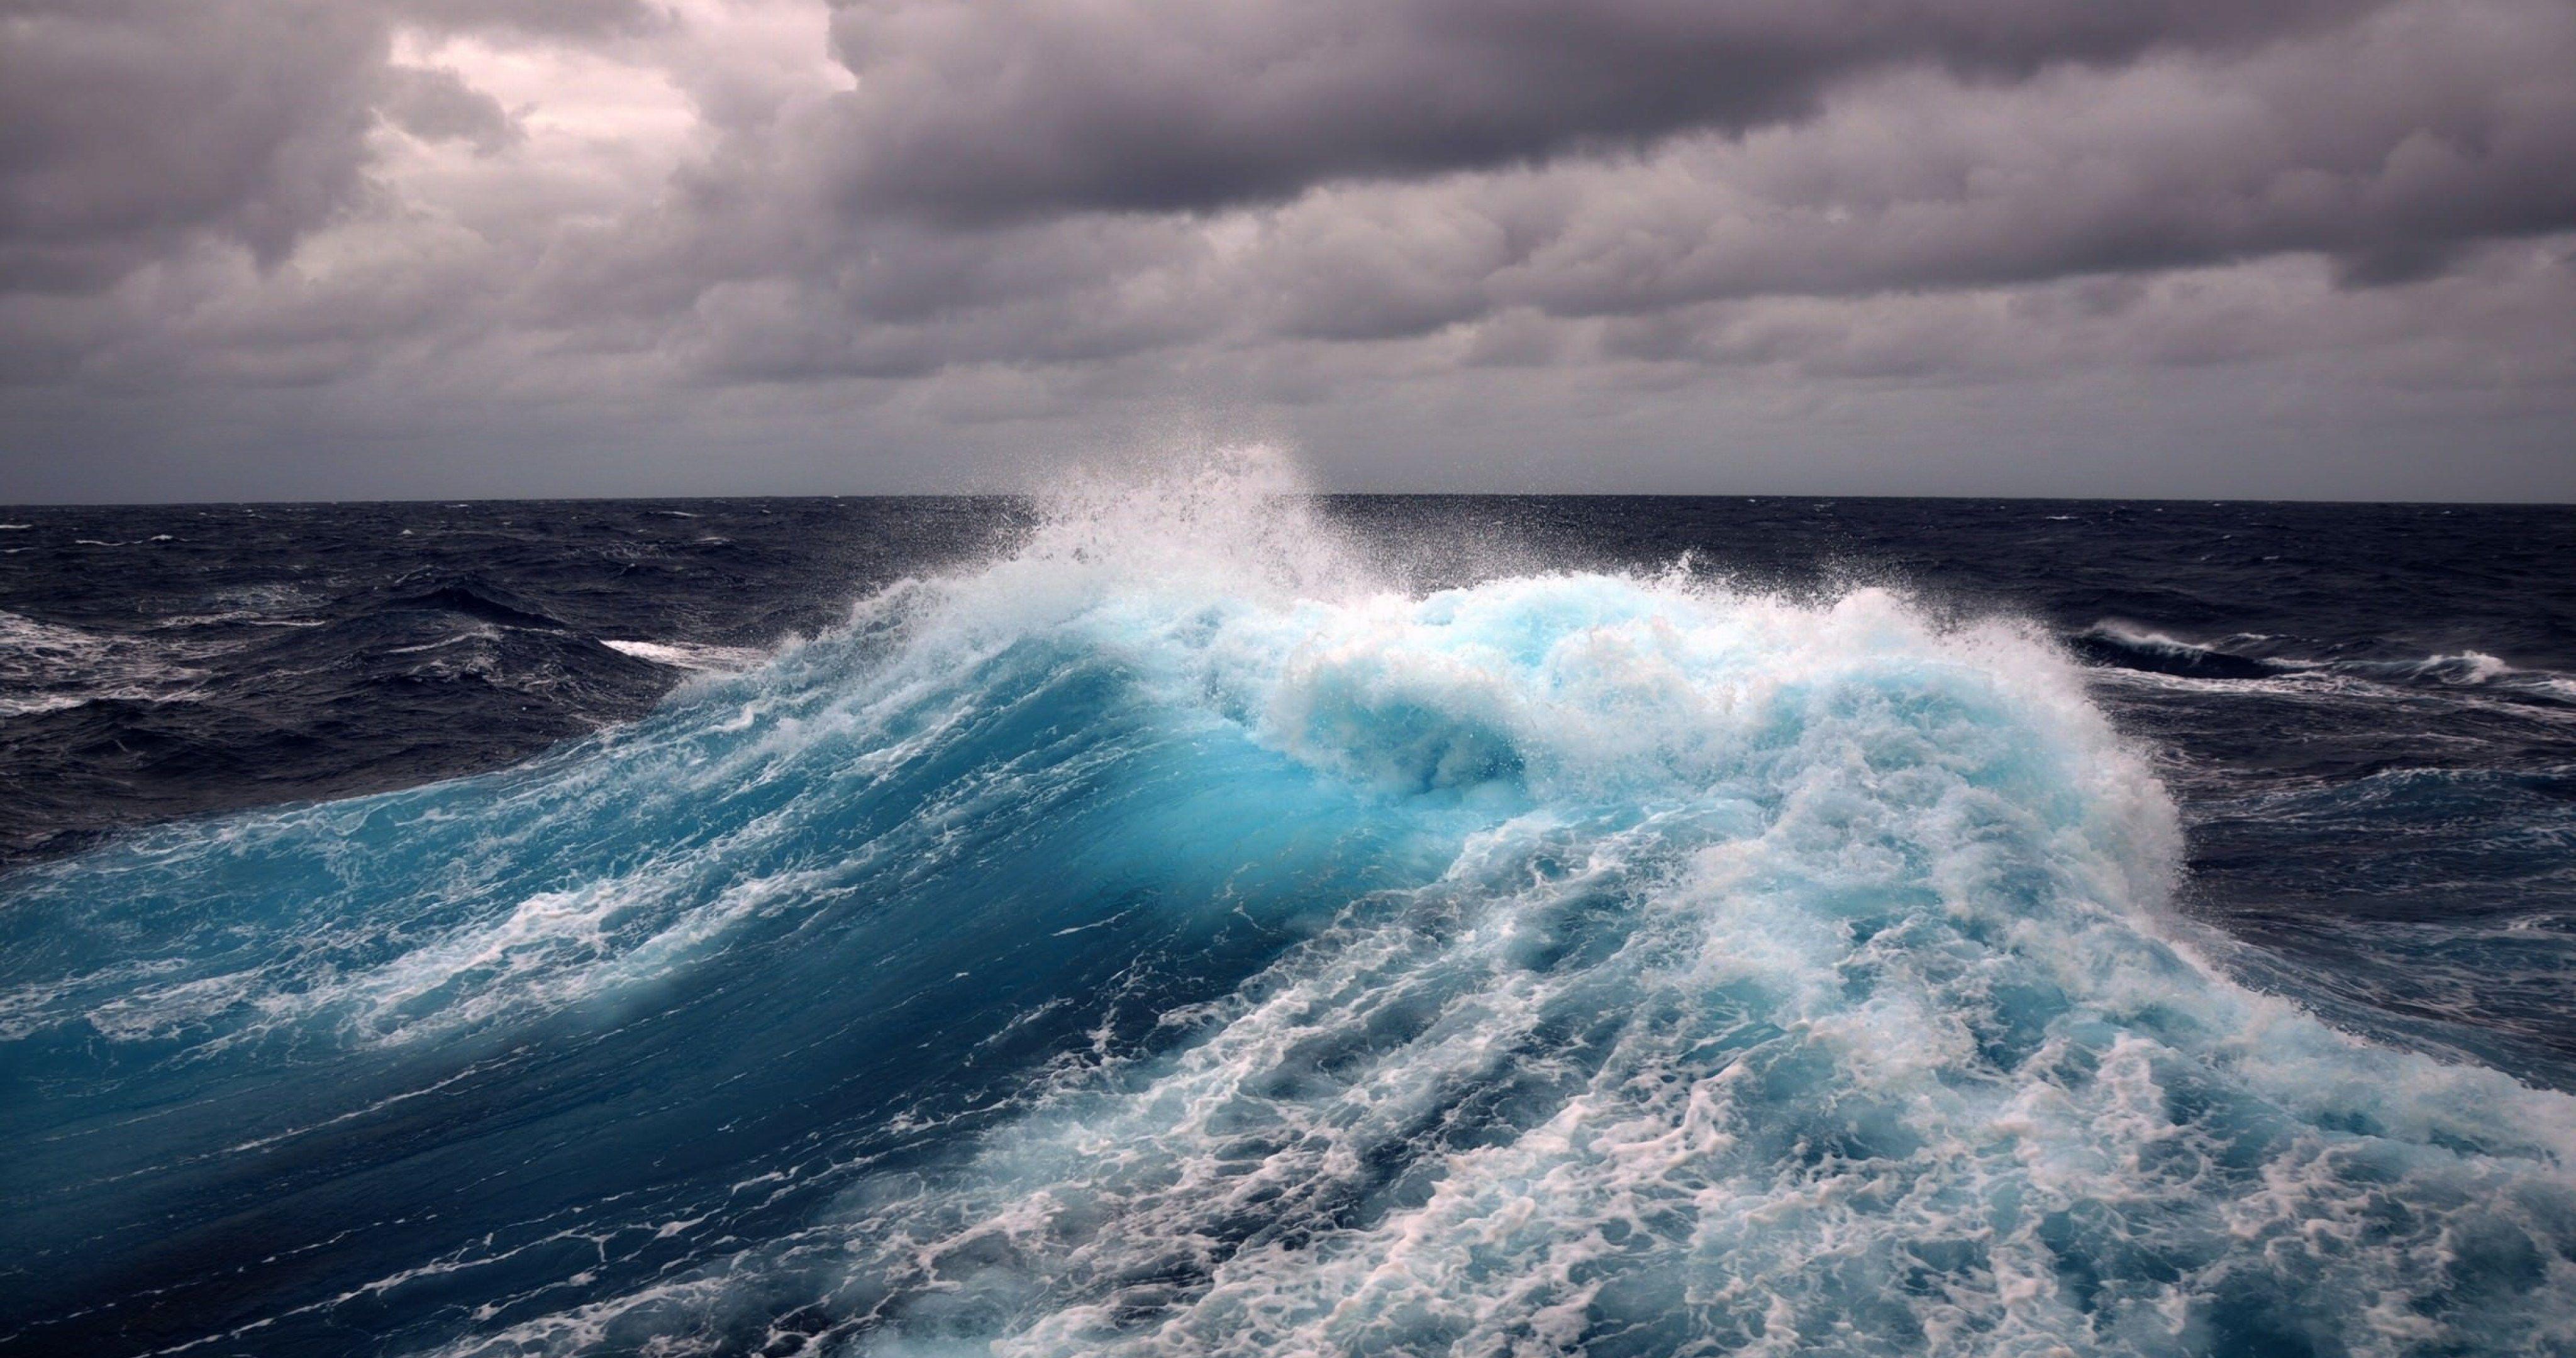 Water Wave 4k Ultra Hd Wallpaper Waves Wallpaper Ocean Waves Waves